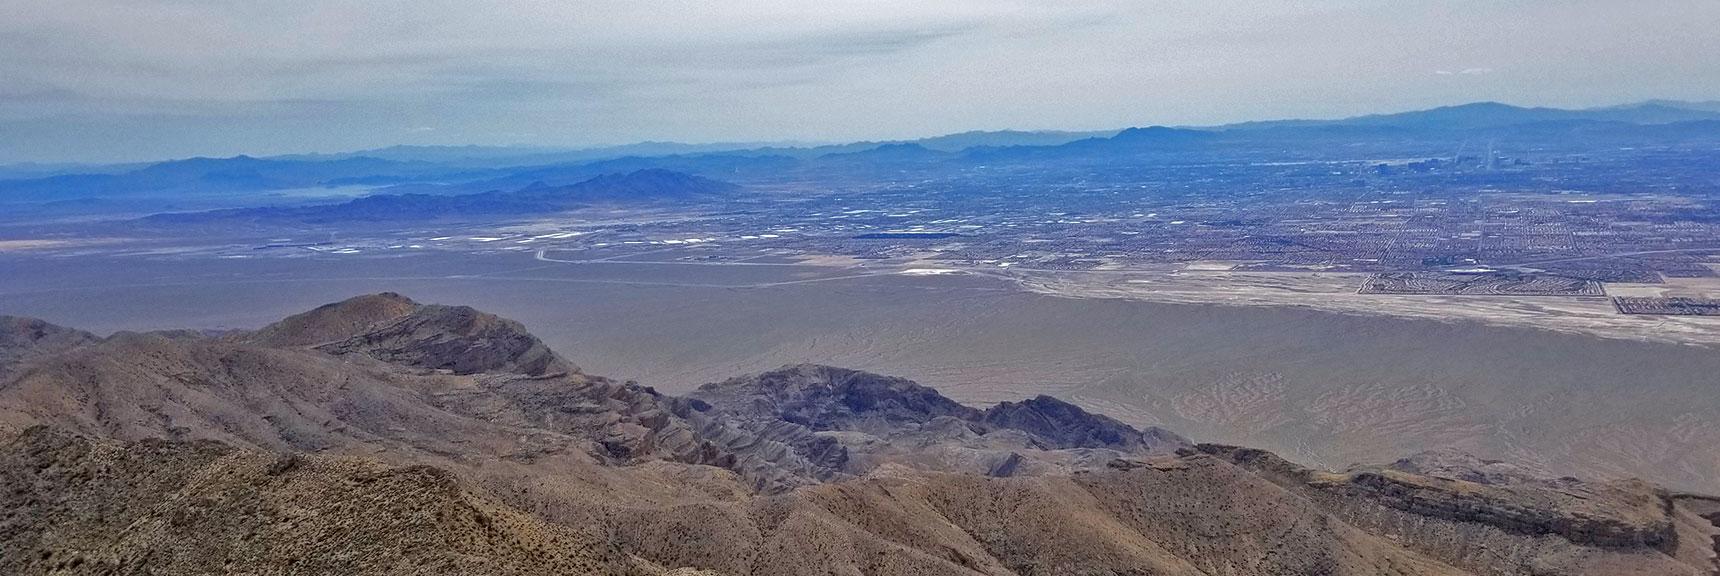 View of Eastern Las Vegas and Lake Mead from Near the Eastern Summit of Gass Peak | Gass Peak Eastern Summit Ultra-marathon Adventure, Nevada